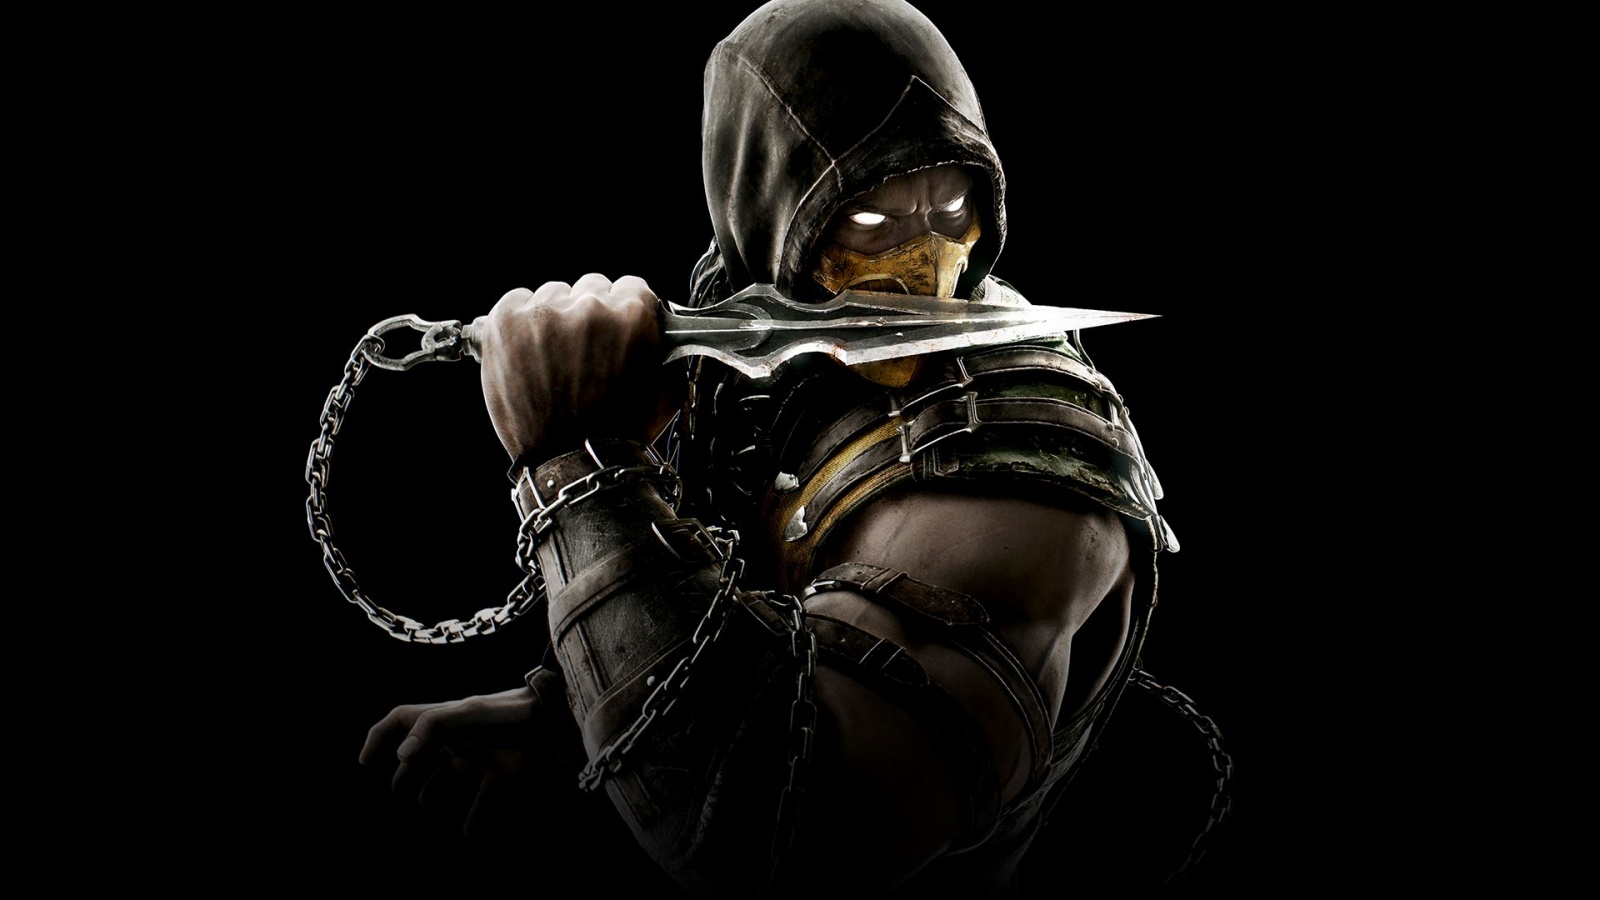 Scorpion Mortal Kombat X Wallpapers HD Wallpapers 1600x900